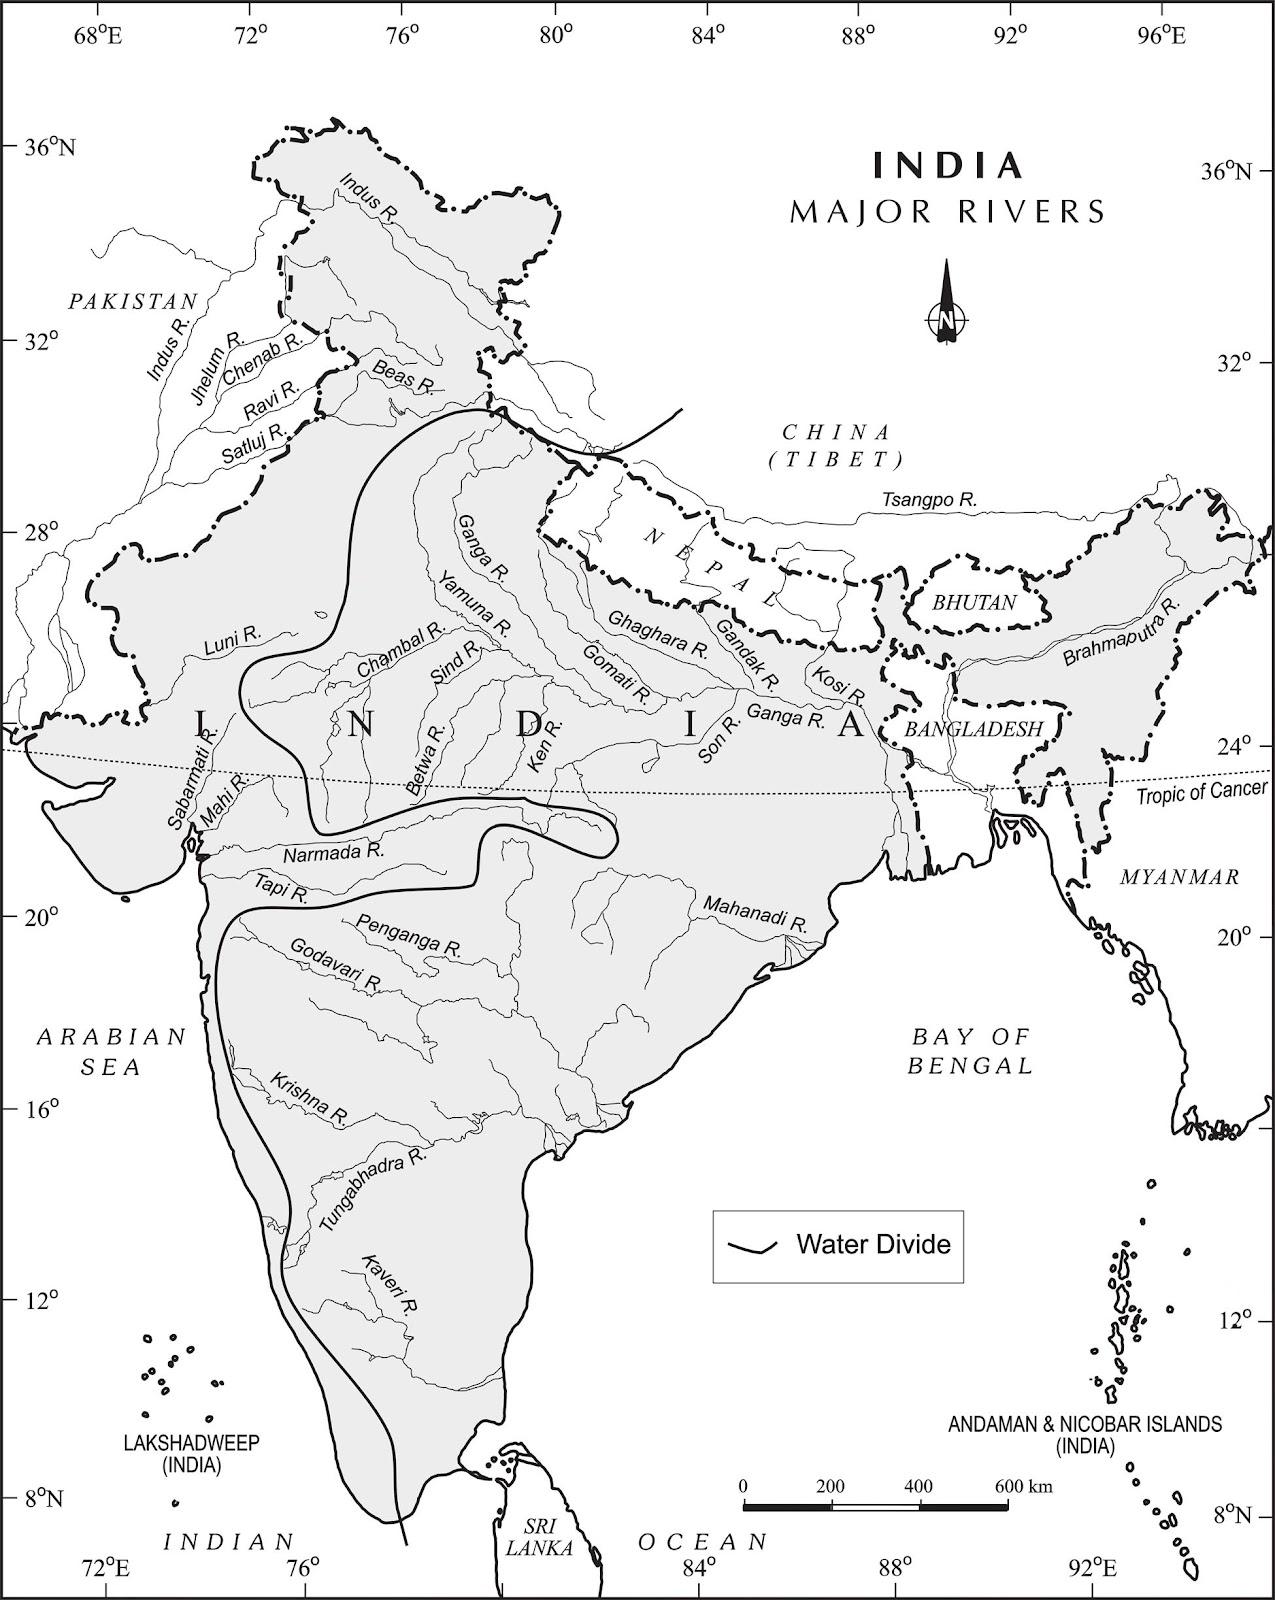 UPSC general studies and current affairs 2015: Major